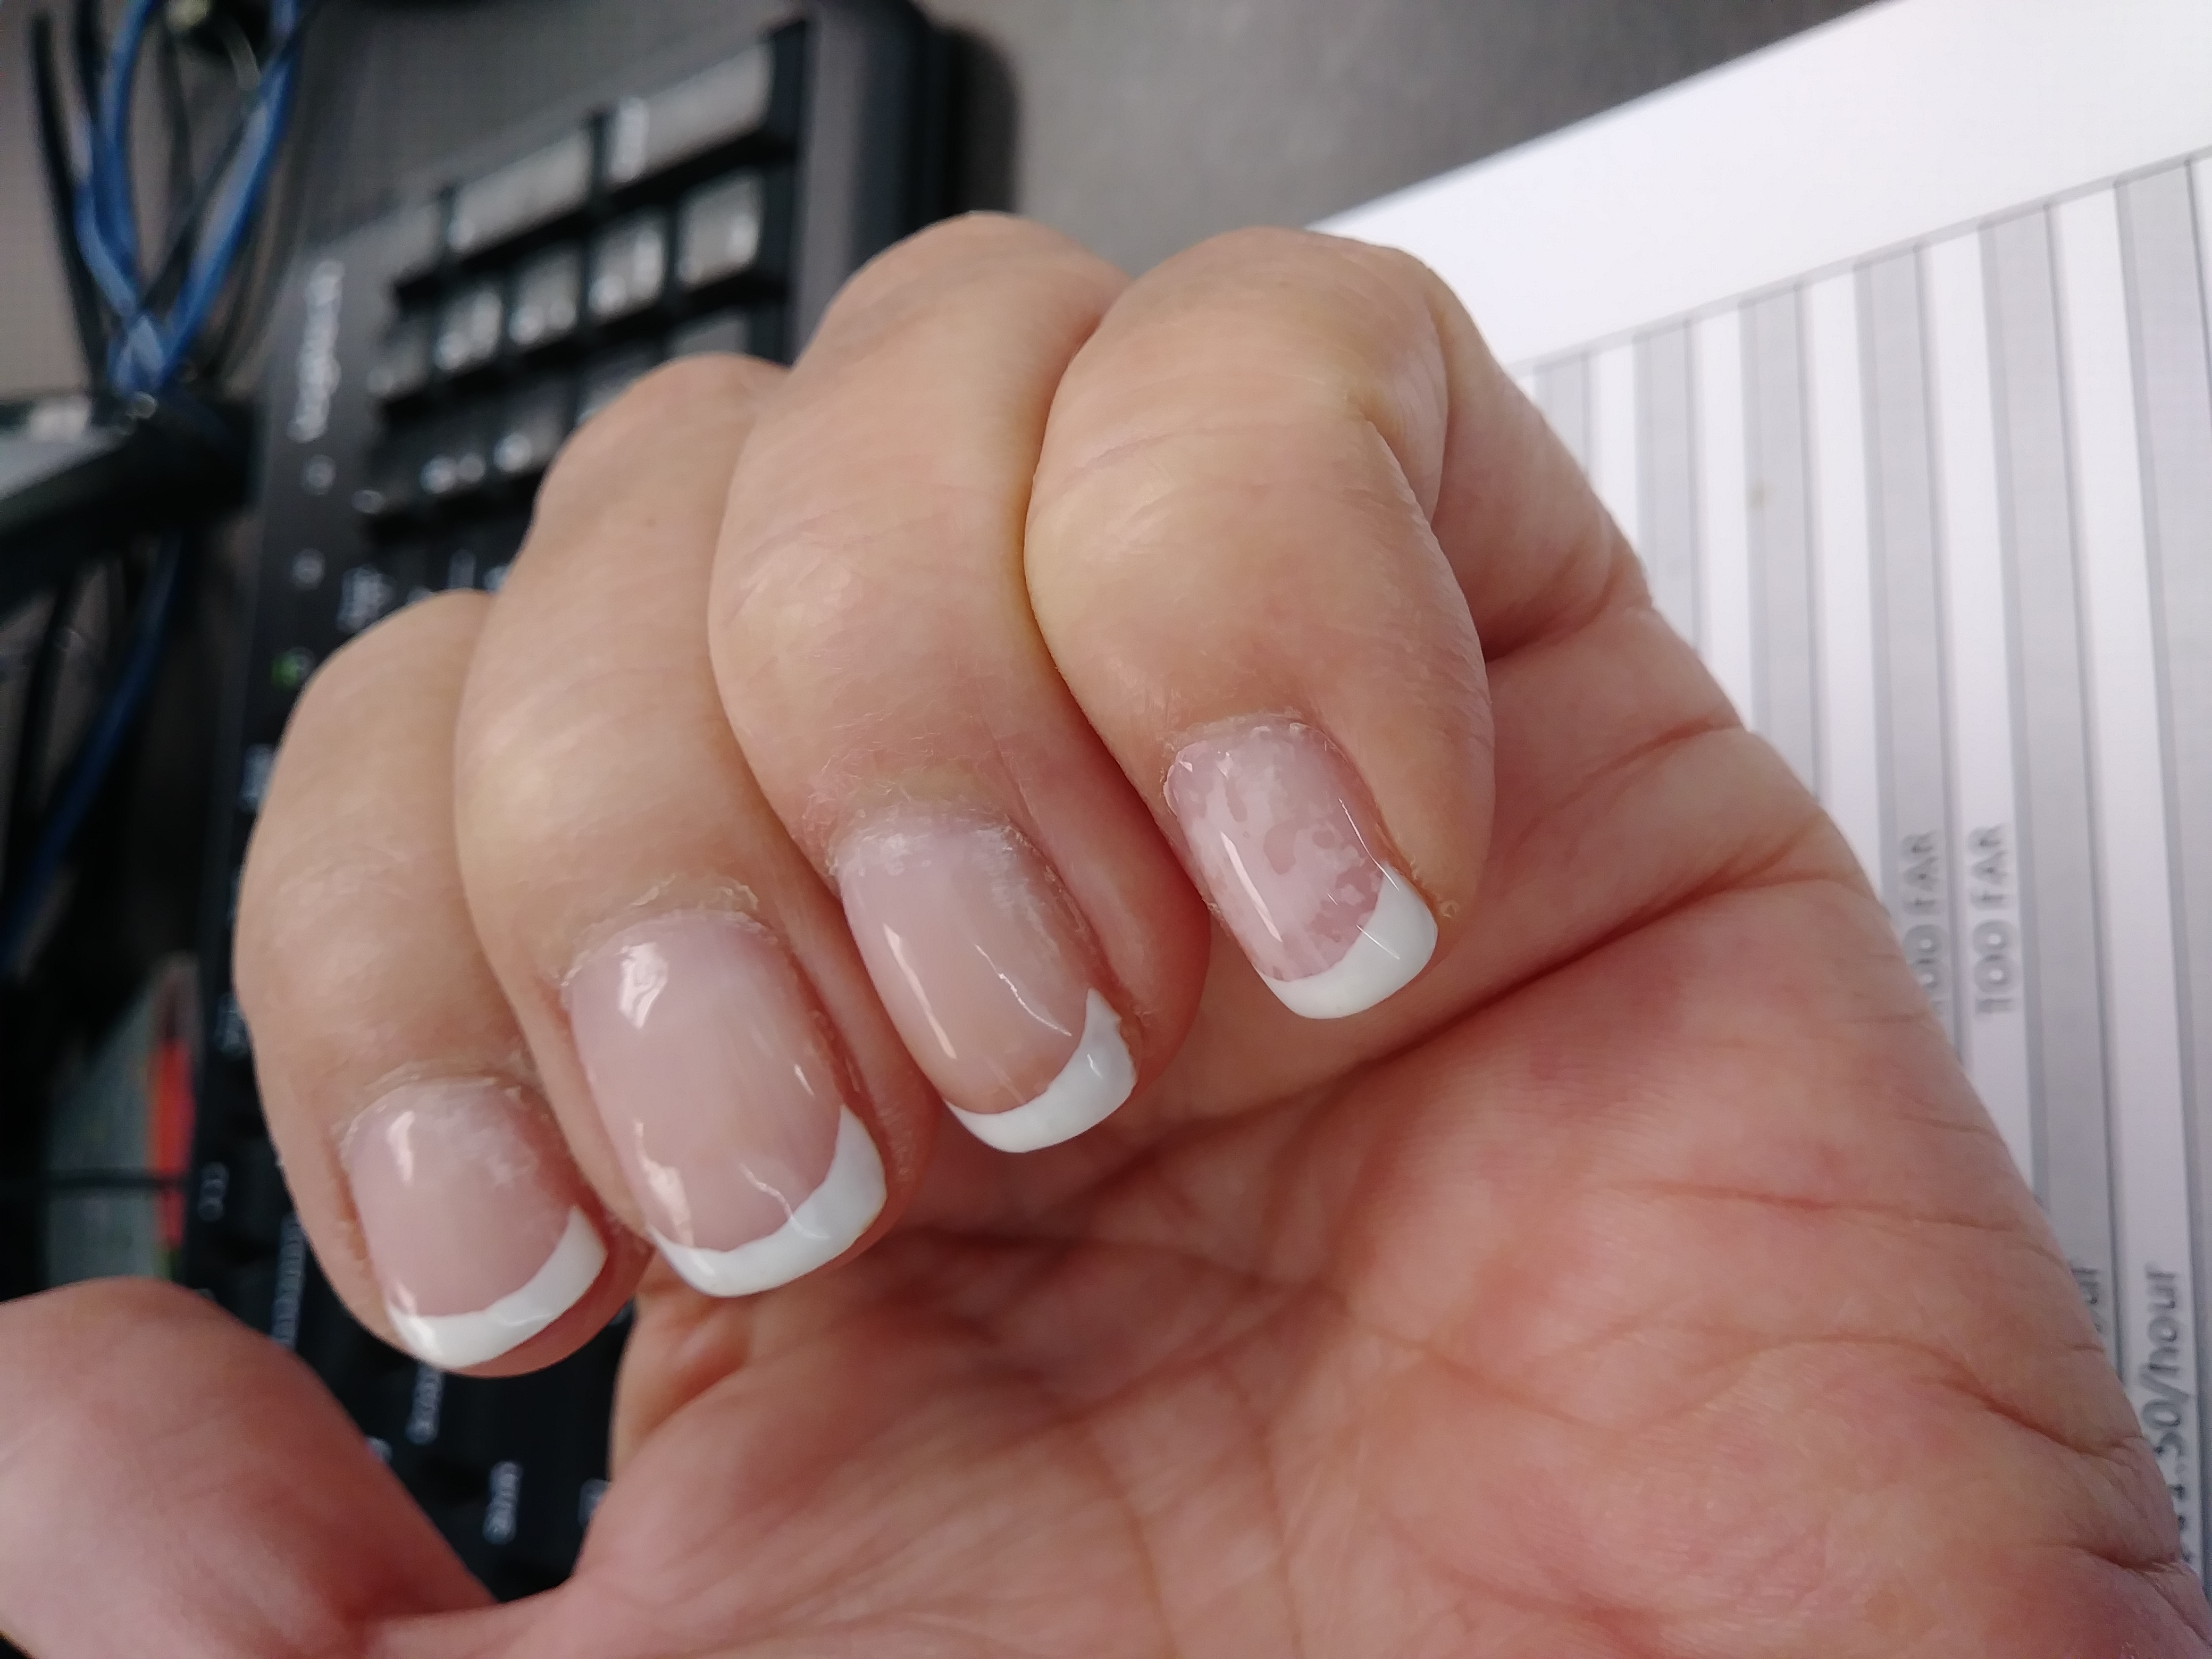 Luxury Nails And Spa Hutchinson Ks Embellishment - Nail Art Design ...